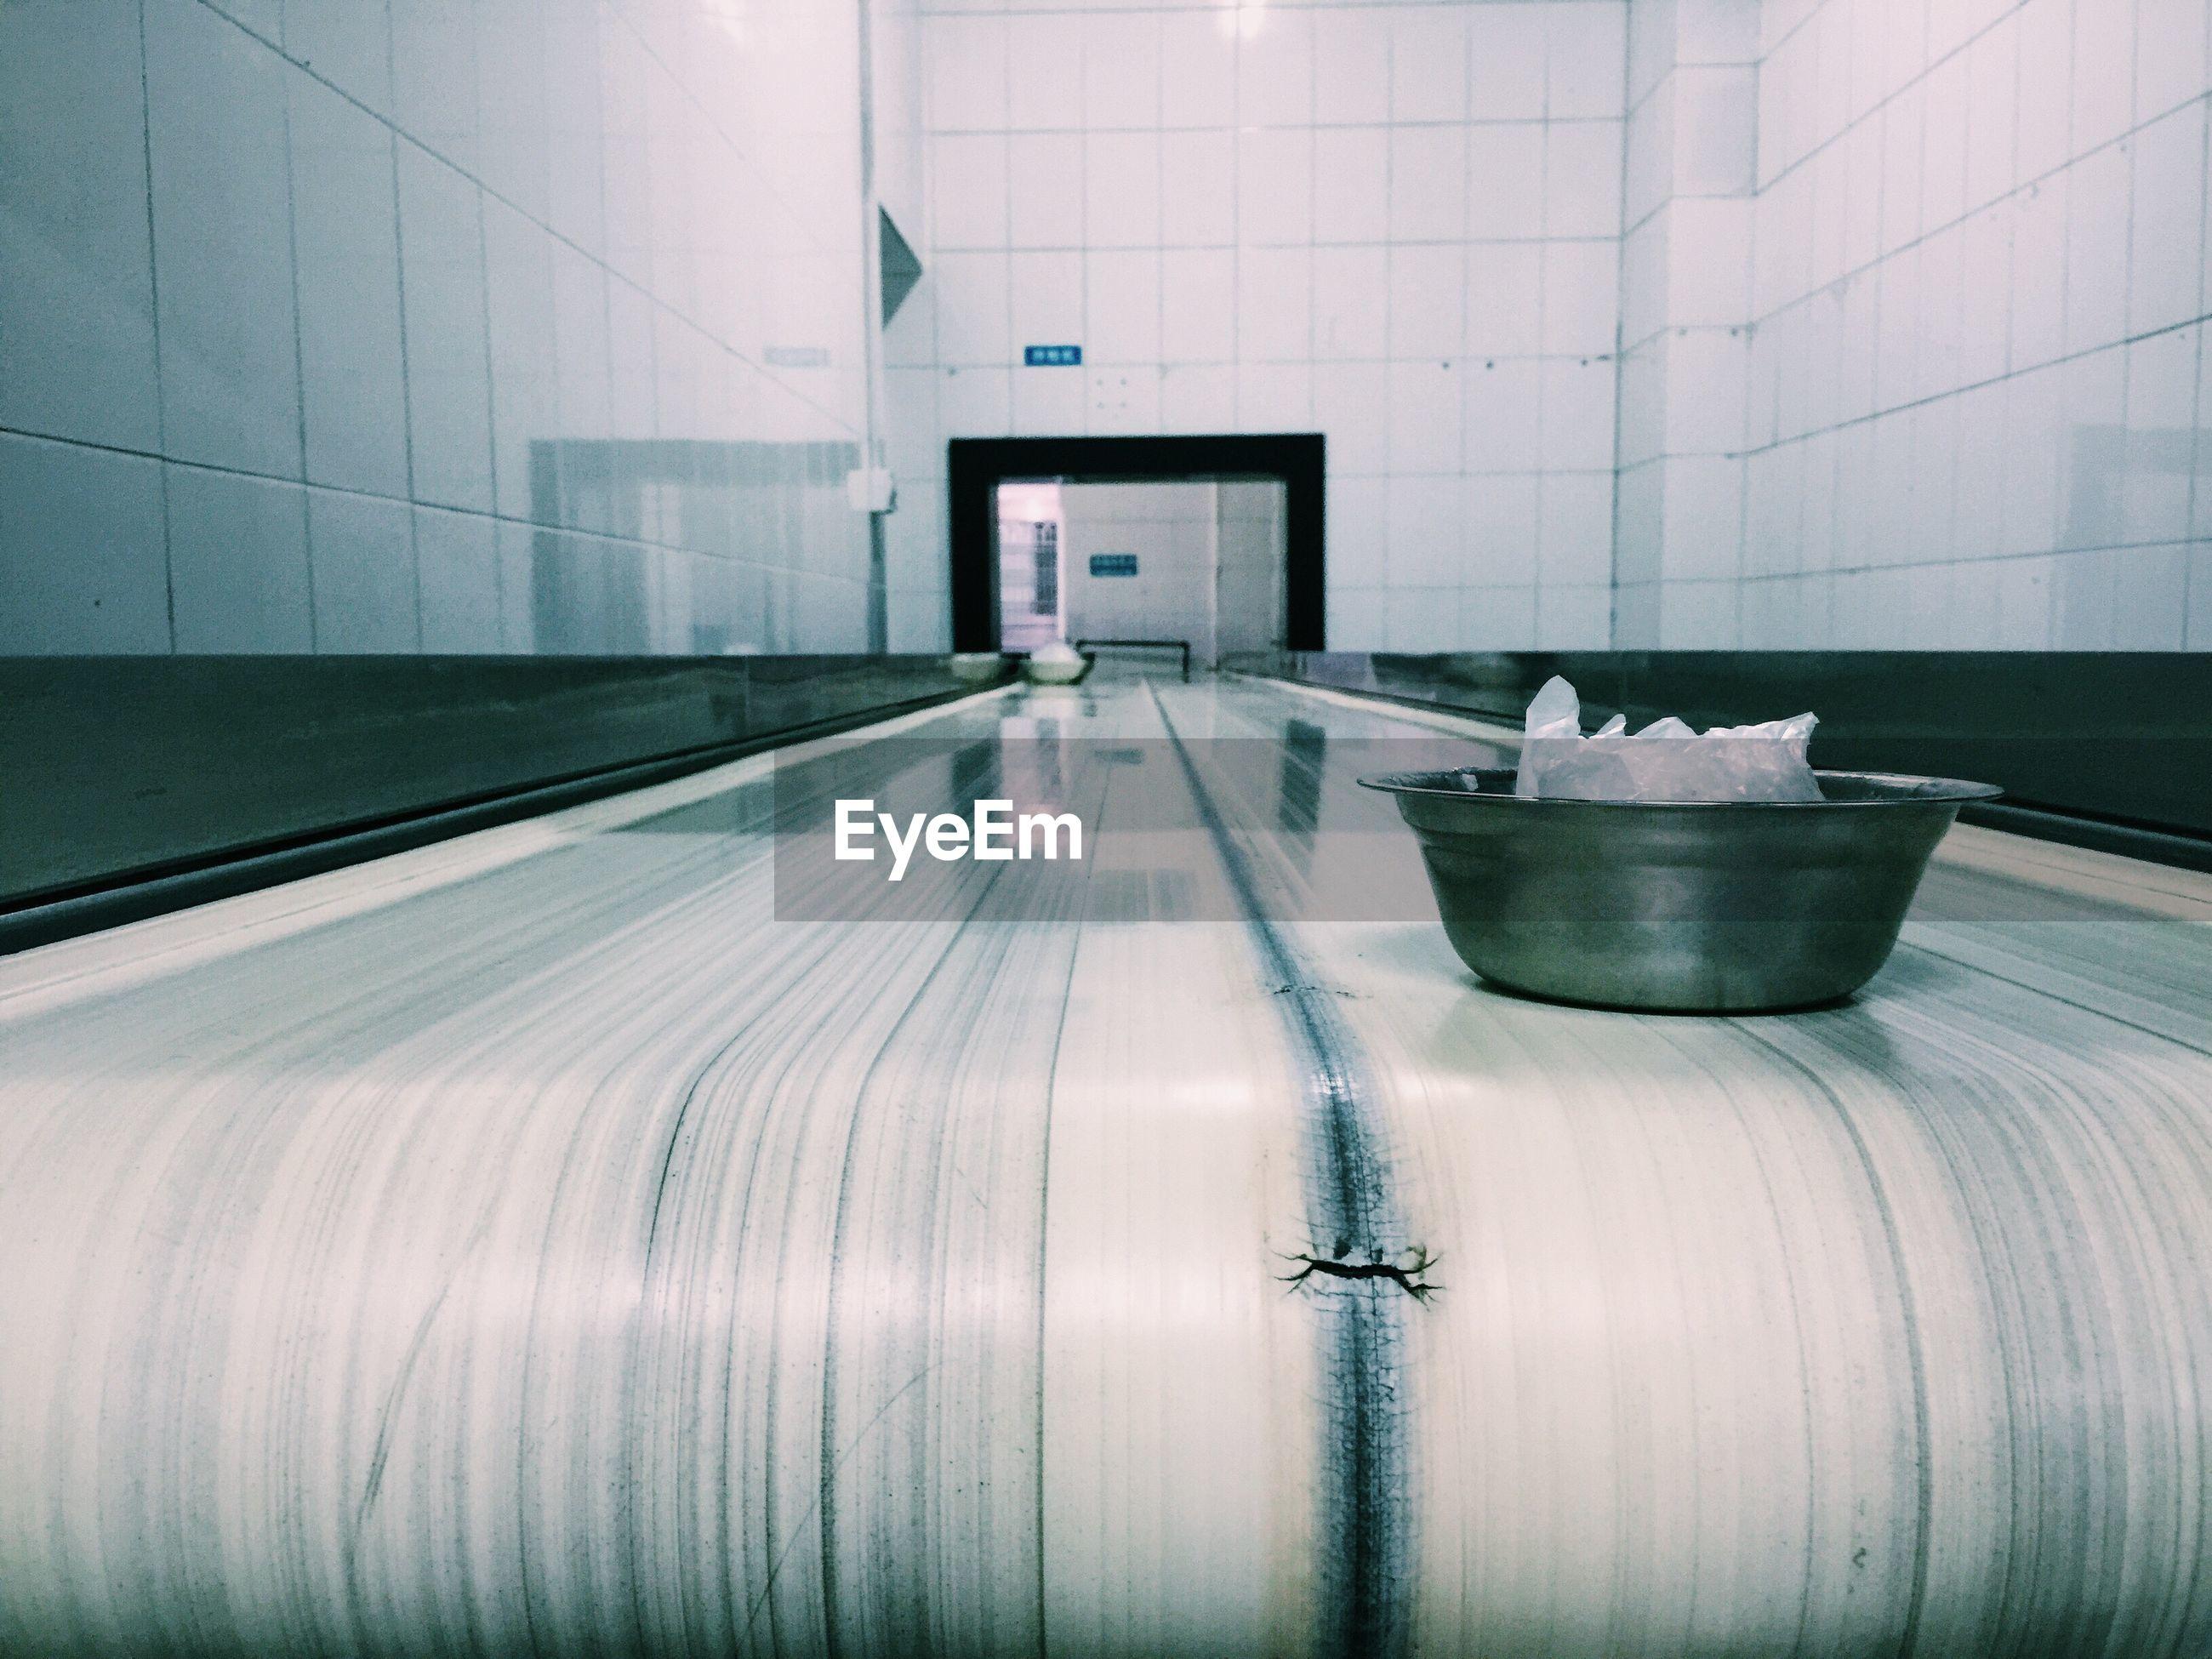 Bowl on conveyor belt in factory